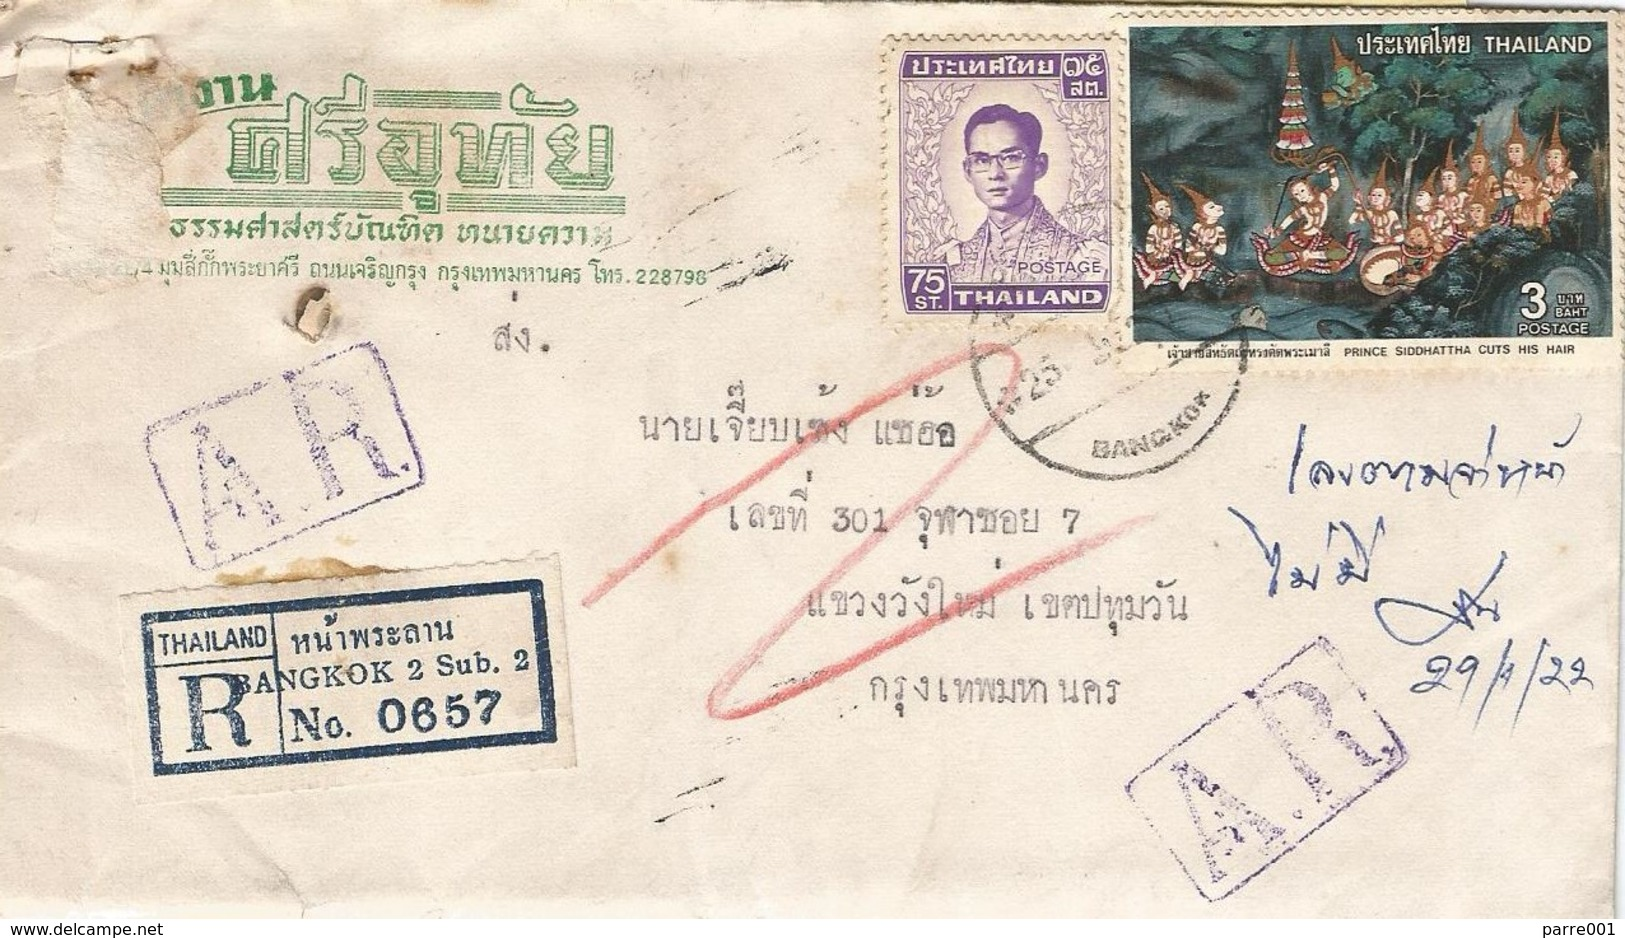 Thailand 1978 Bangkok 2 Buddhism Cutting Hair Registered AR Advice Of Receipt Returned Domestic Cover - Buddhismus